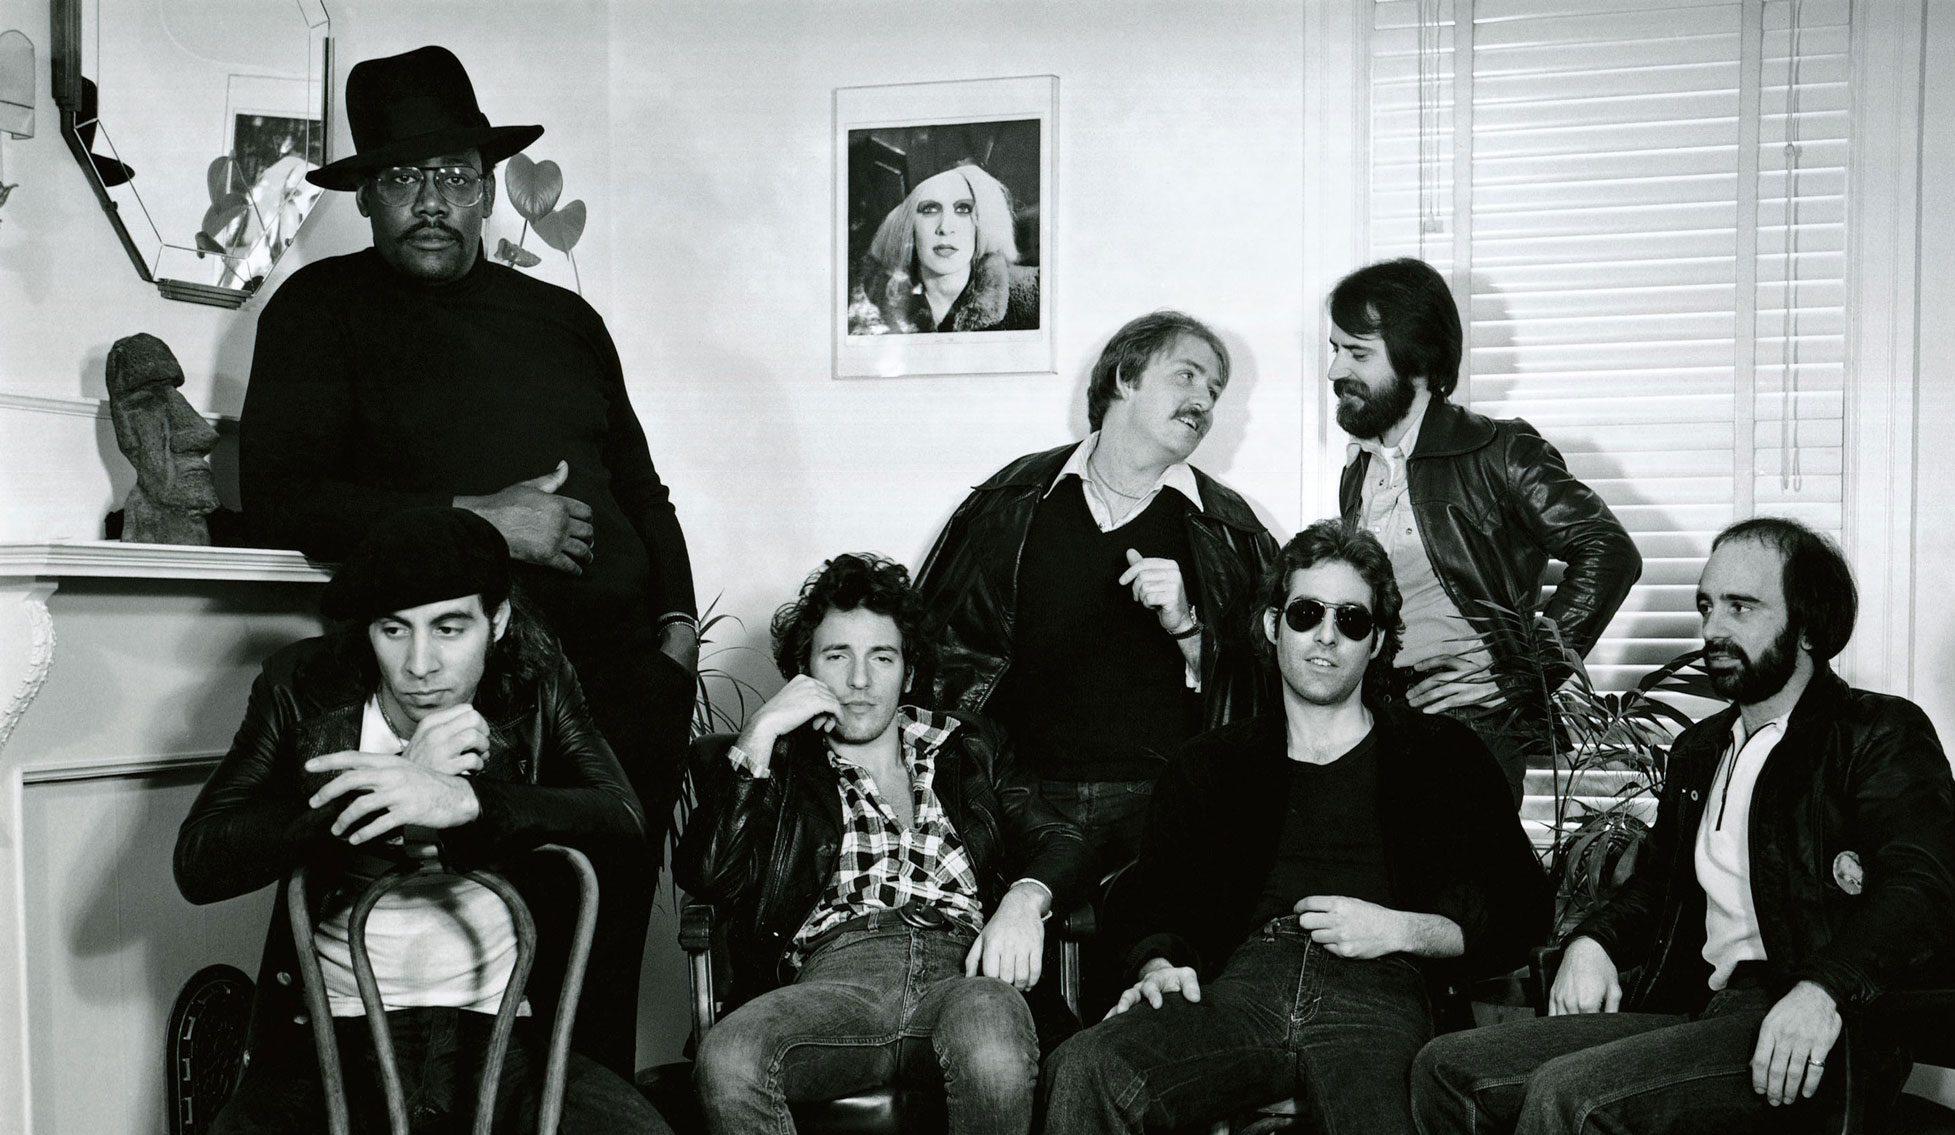 Plaat van de week: Bruce Springsteen & The E Street Band – (Love Is Like A) Heatwave